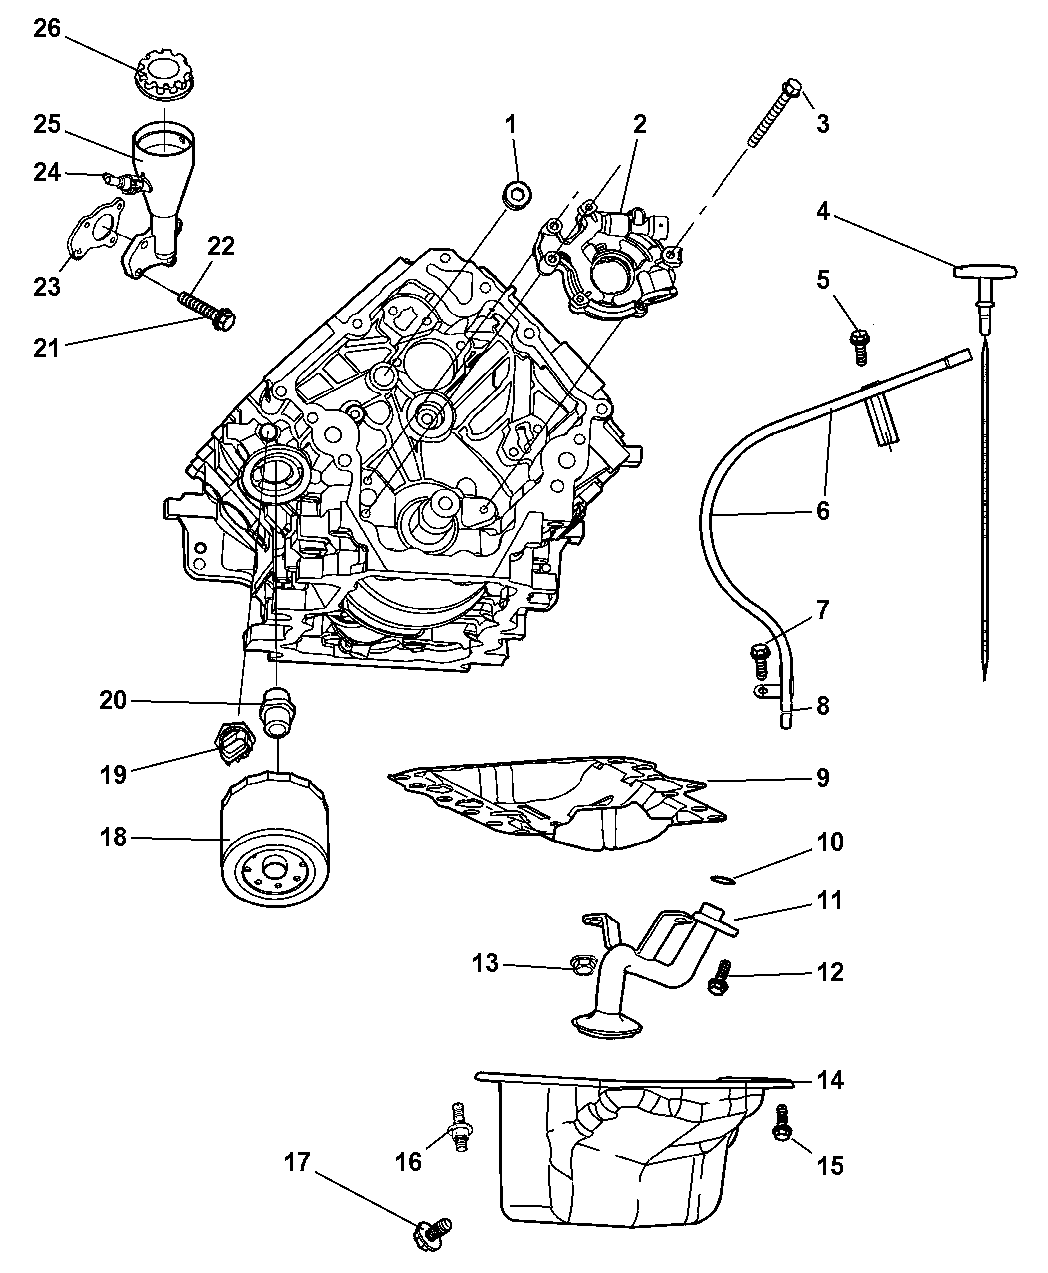 2007 Jeep Commander Engine Diagram